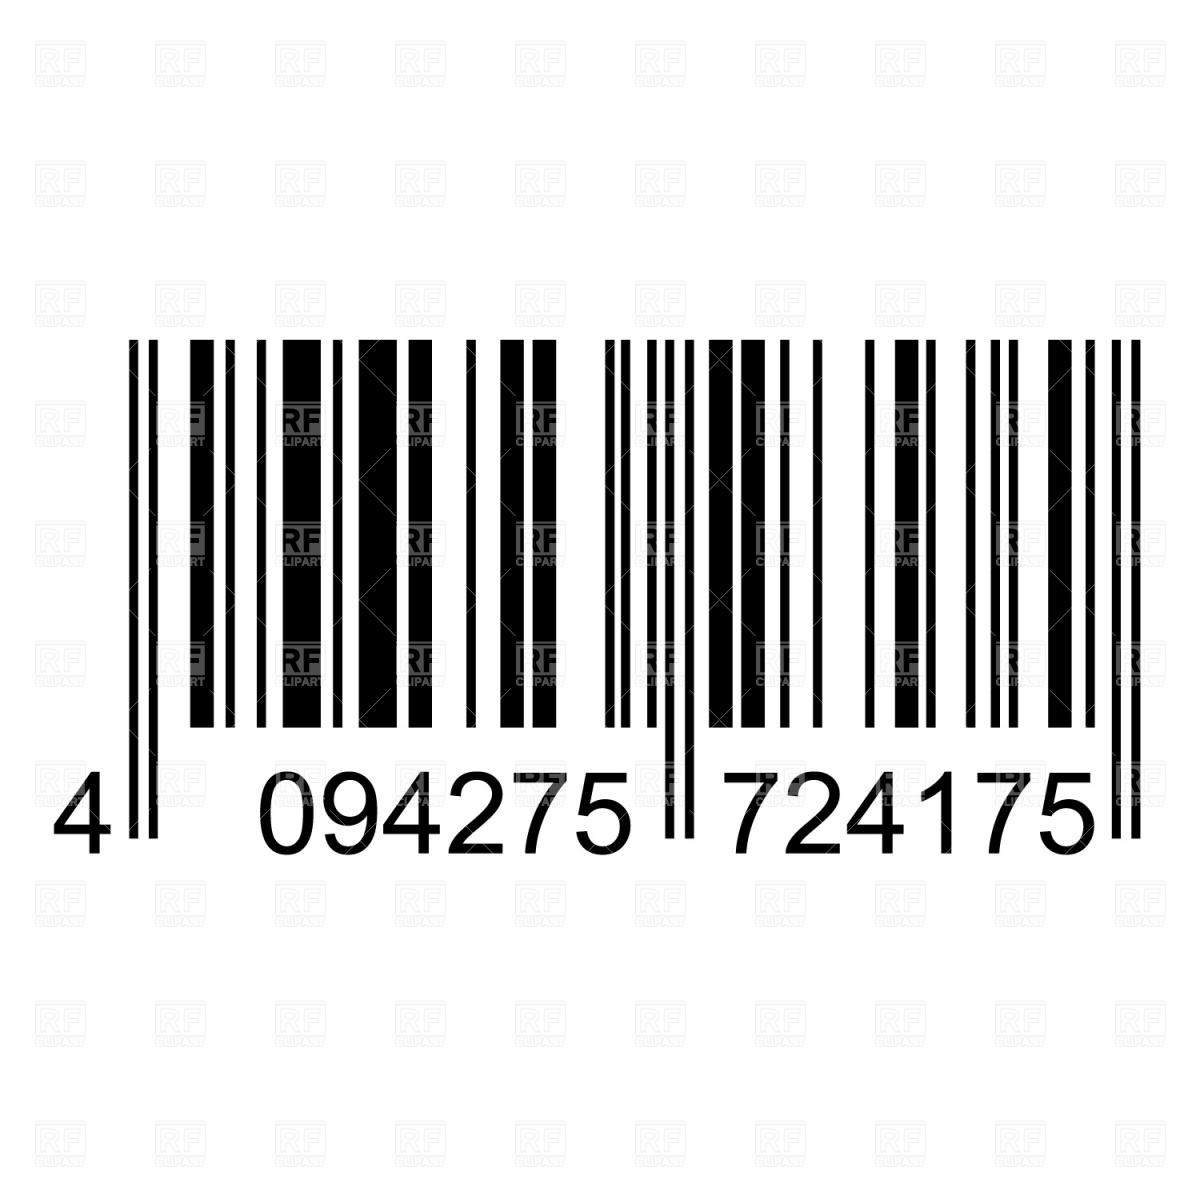 Upc Code Vector